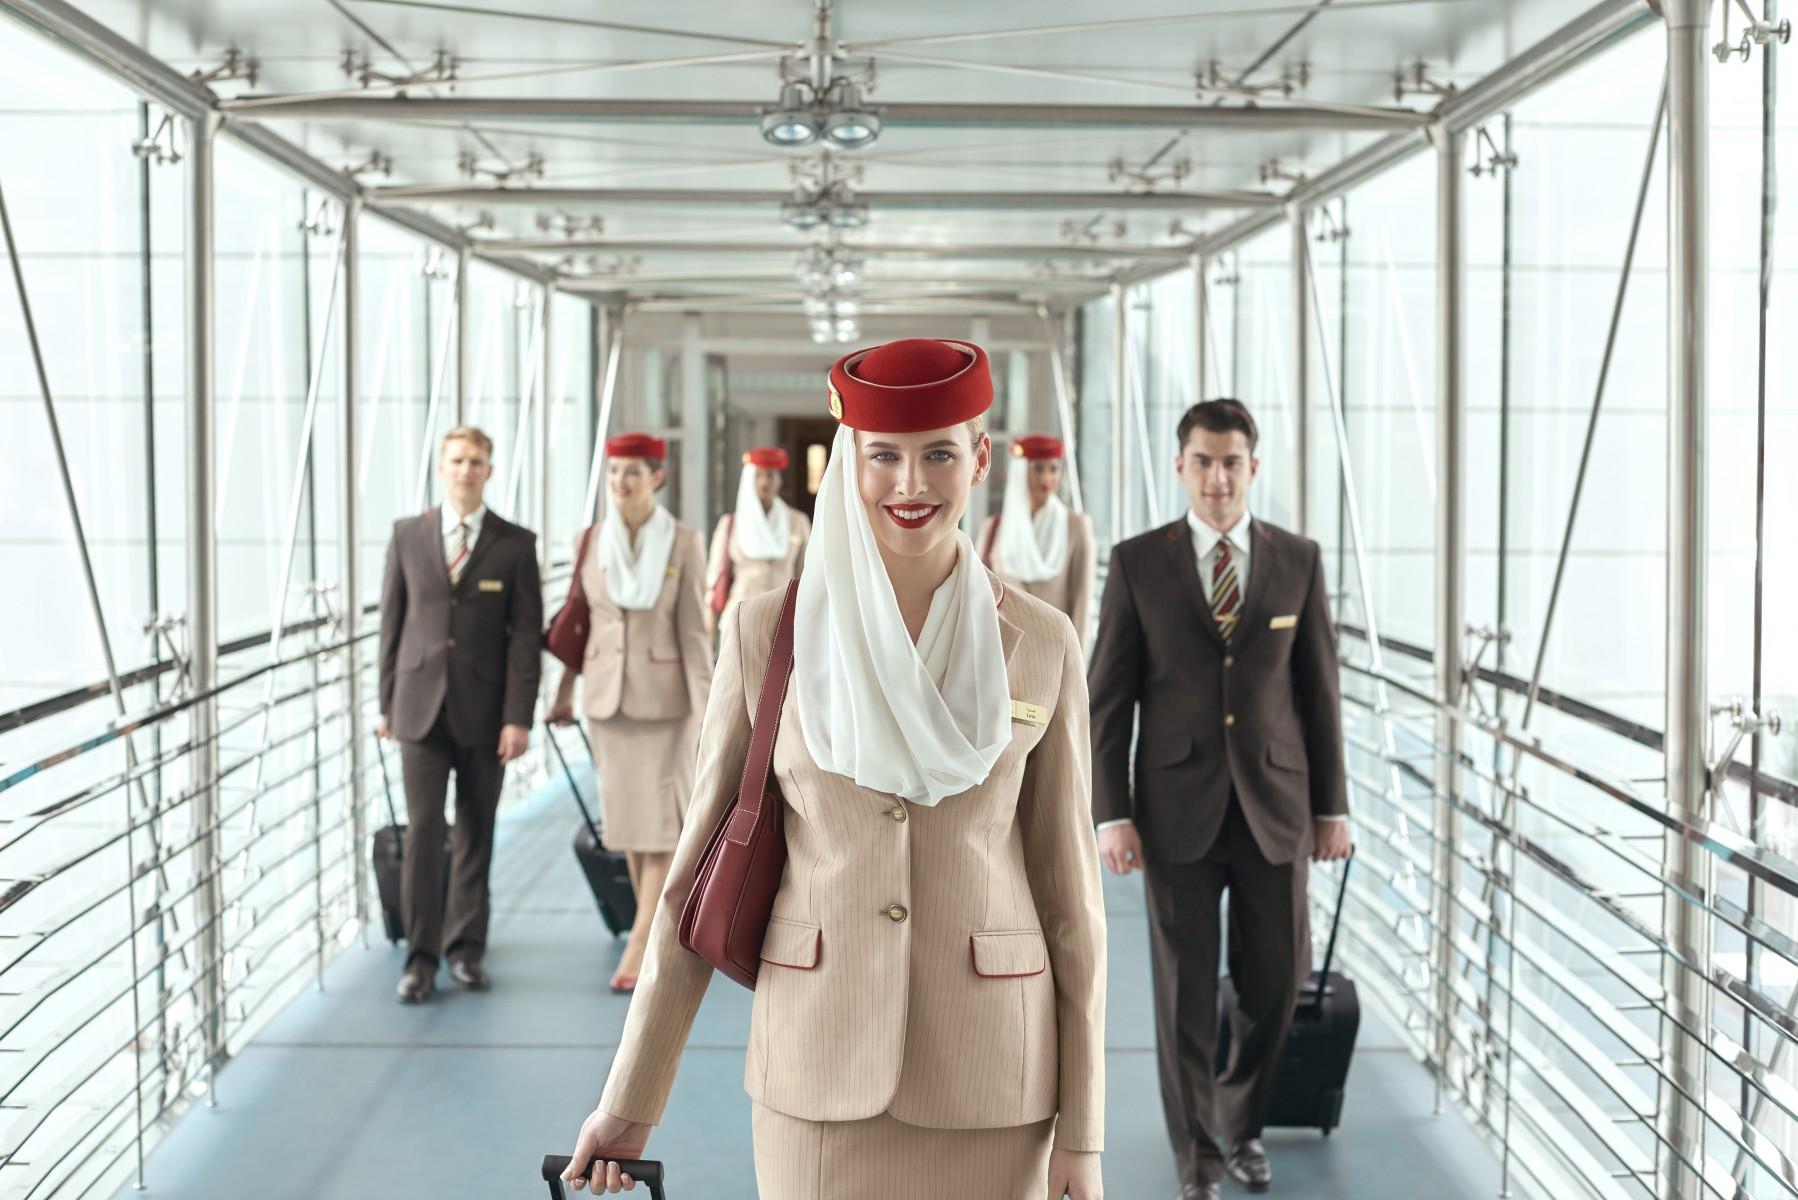 Dating Emirates kabin personal